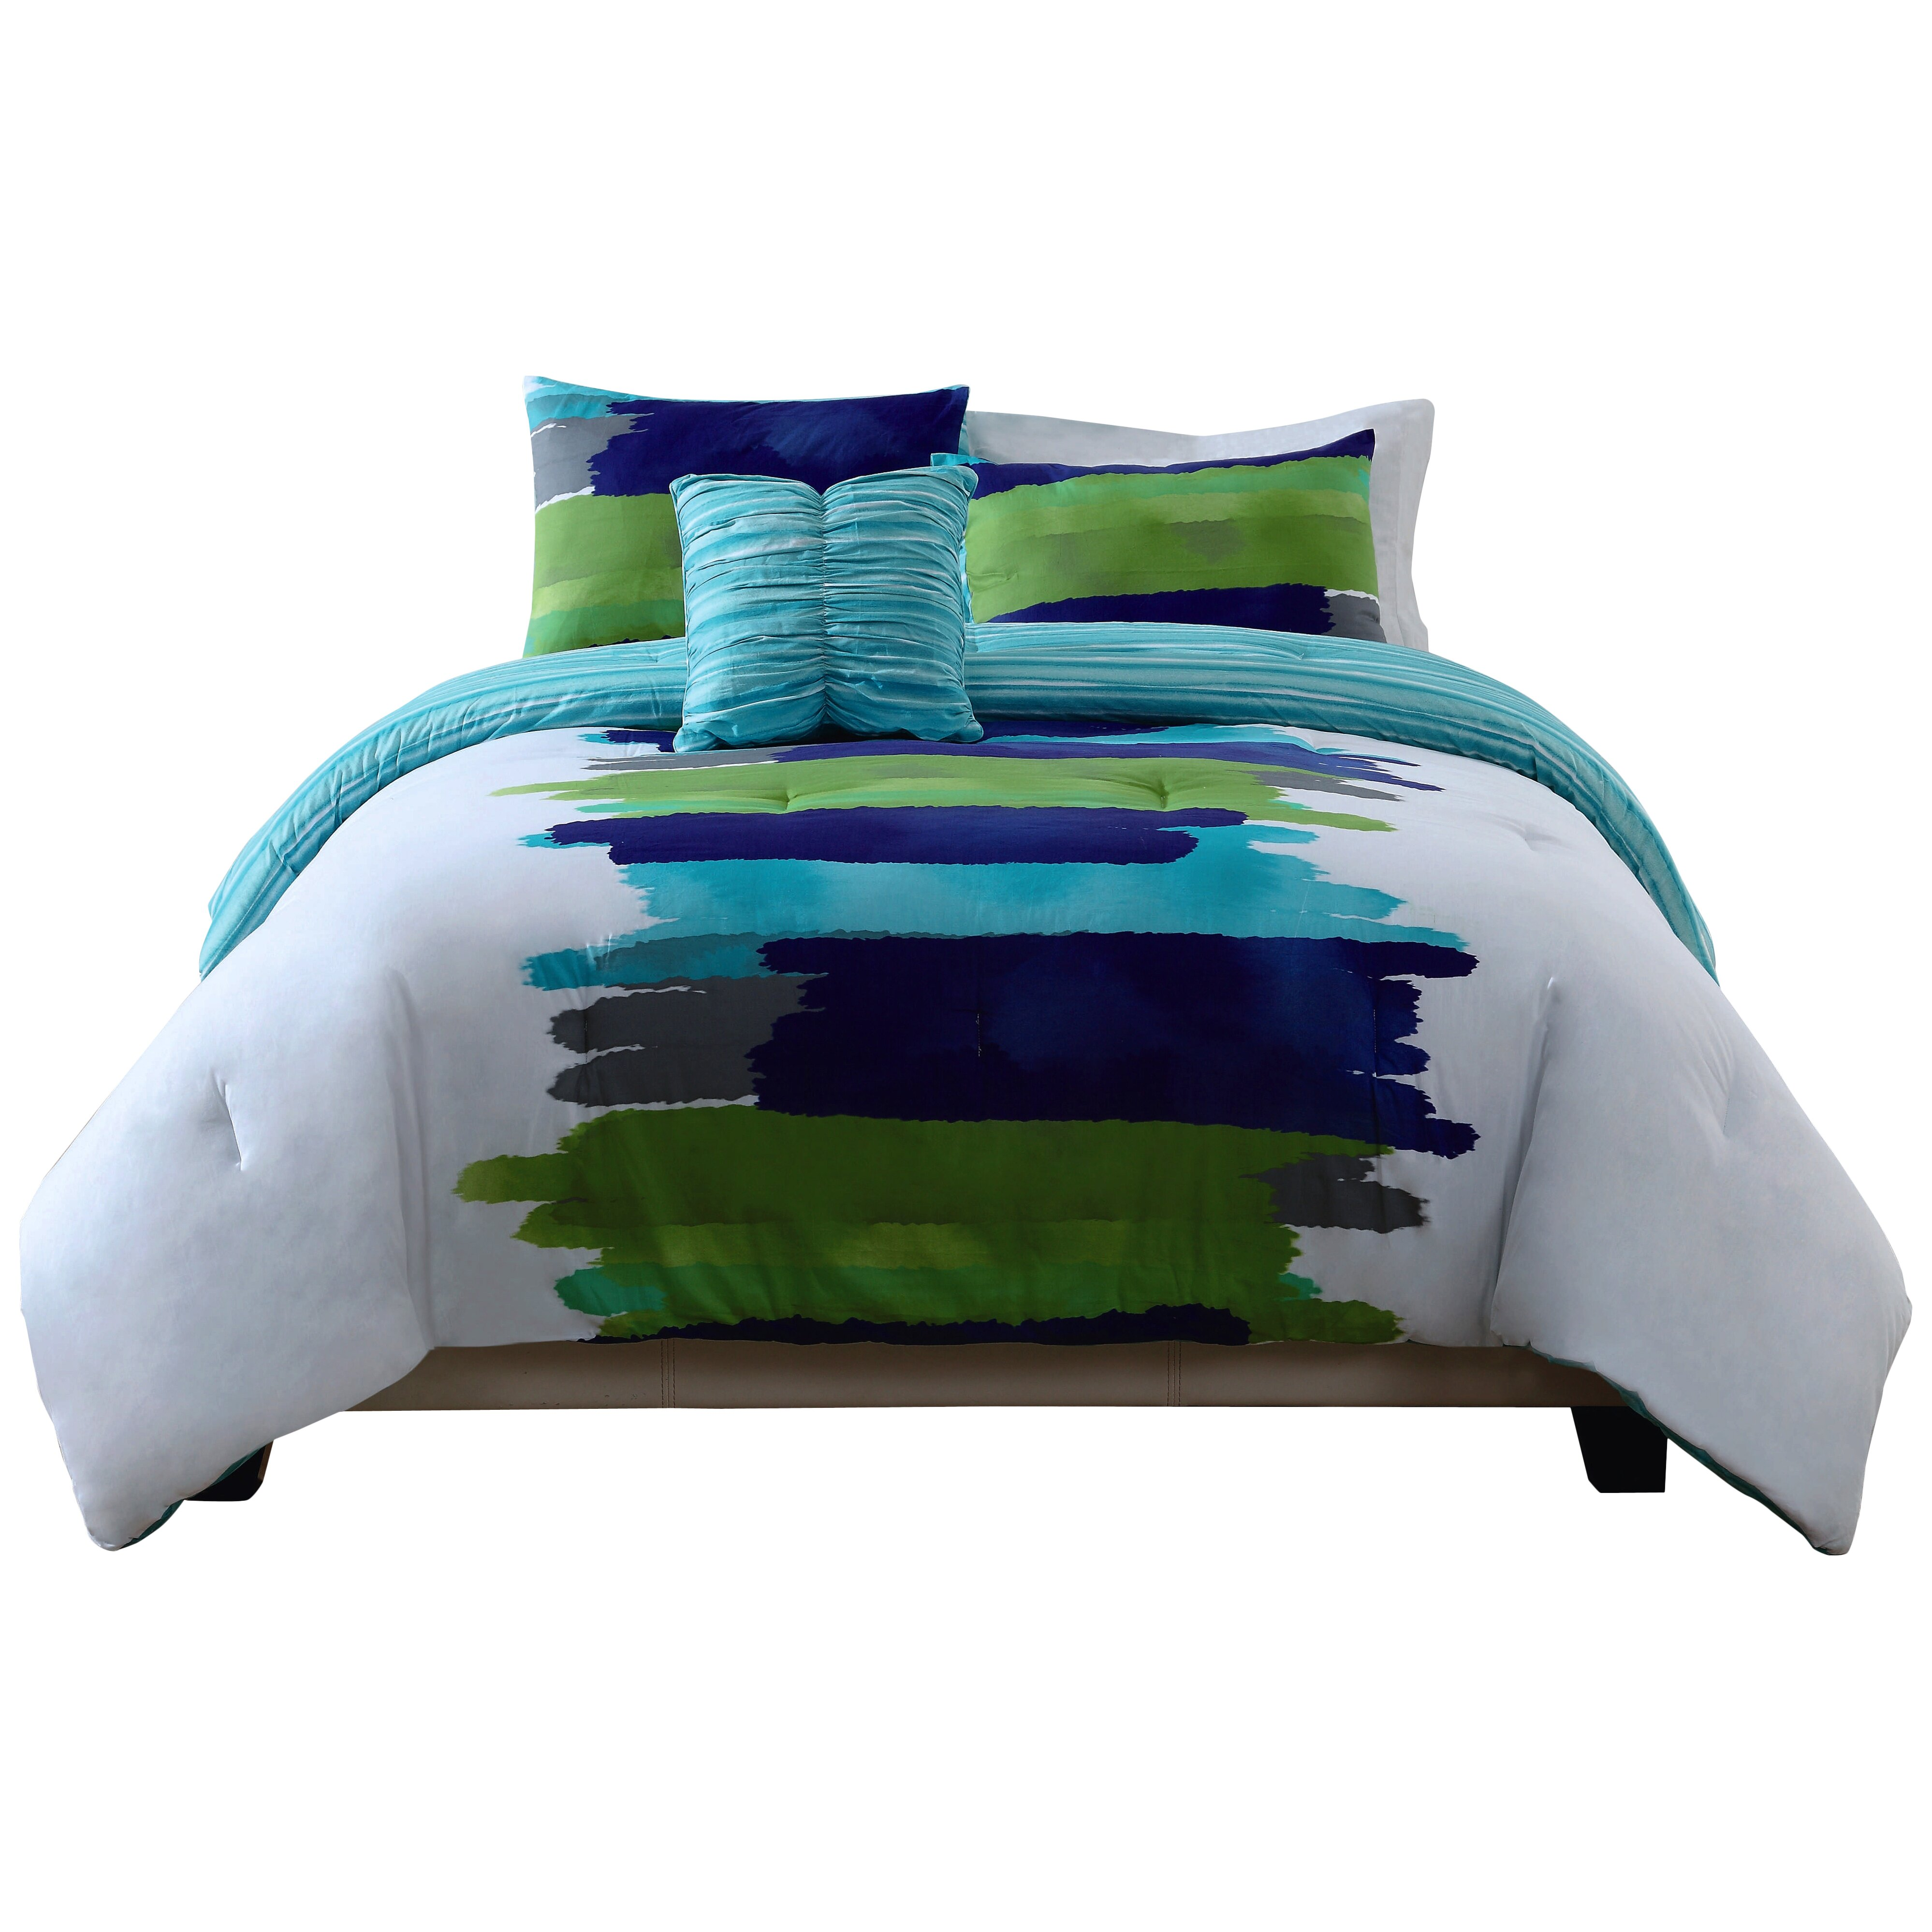 style 212 reversible comforter set in blue green reviews wayfair. Black Bedroom Furniture Sets. Home Design Ideas